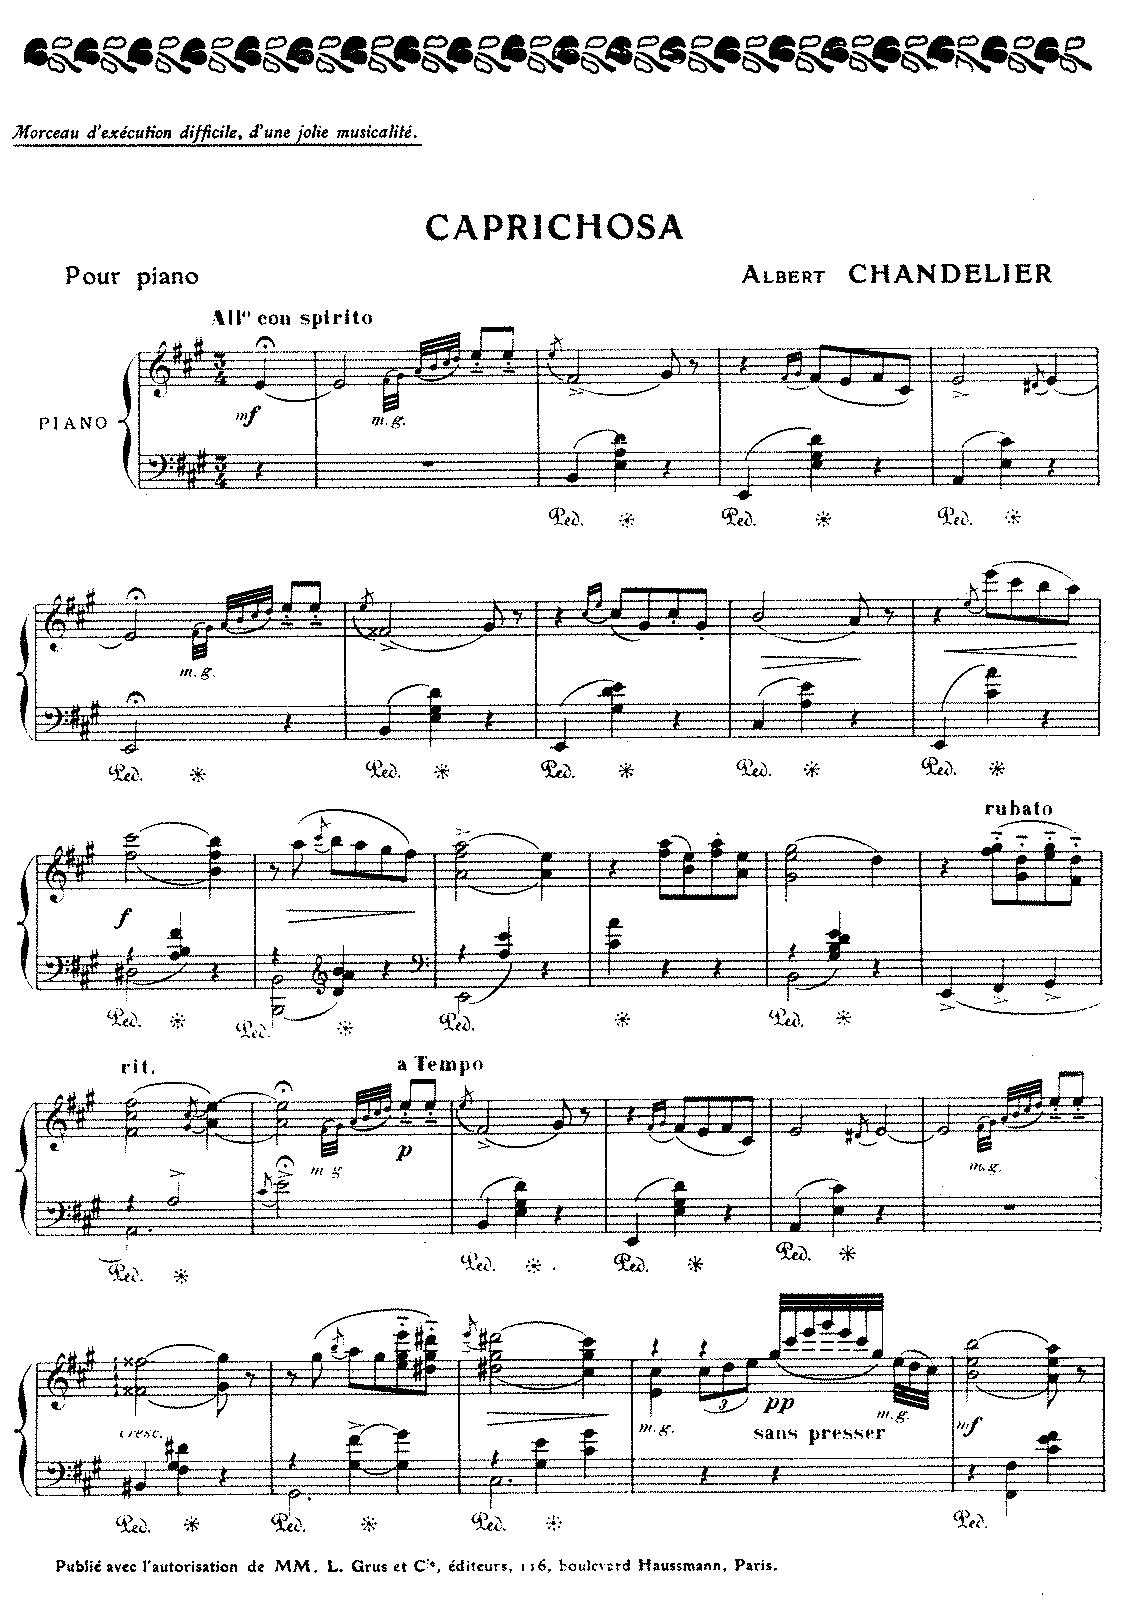 2 Pièces, Opp.23-24 (Chandelier, Albert) - IMSLP/Petrucci Music ...